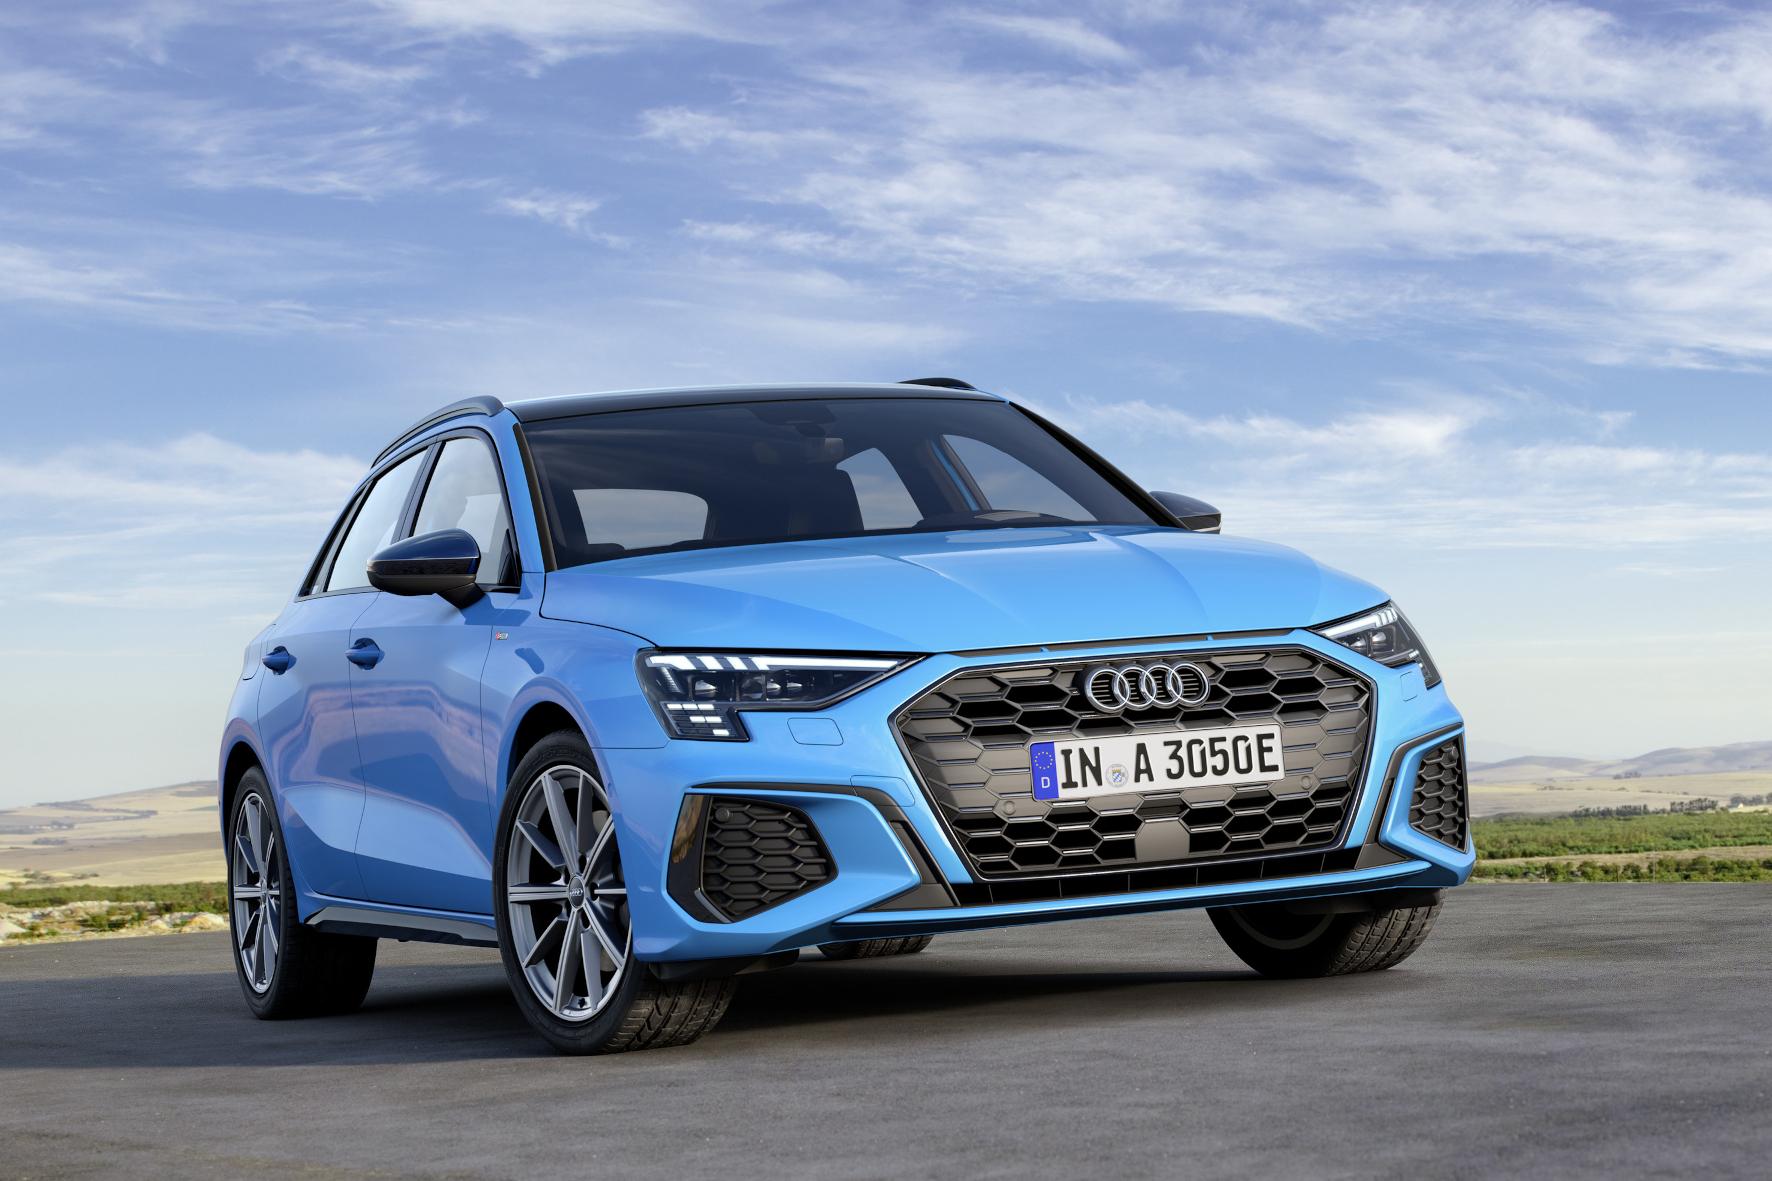 Audi intensiviert seine Elektrifizierungs-Offensive